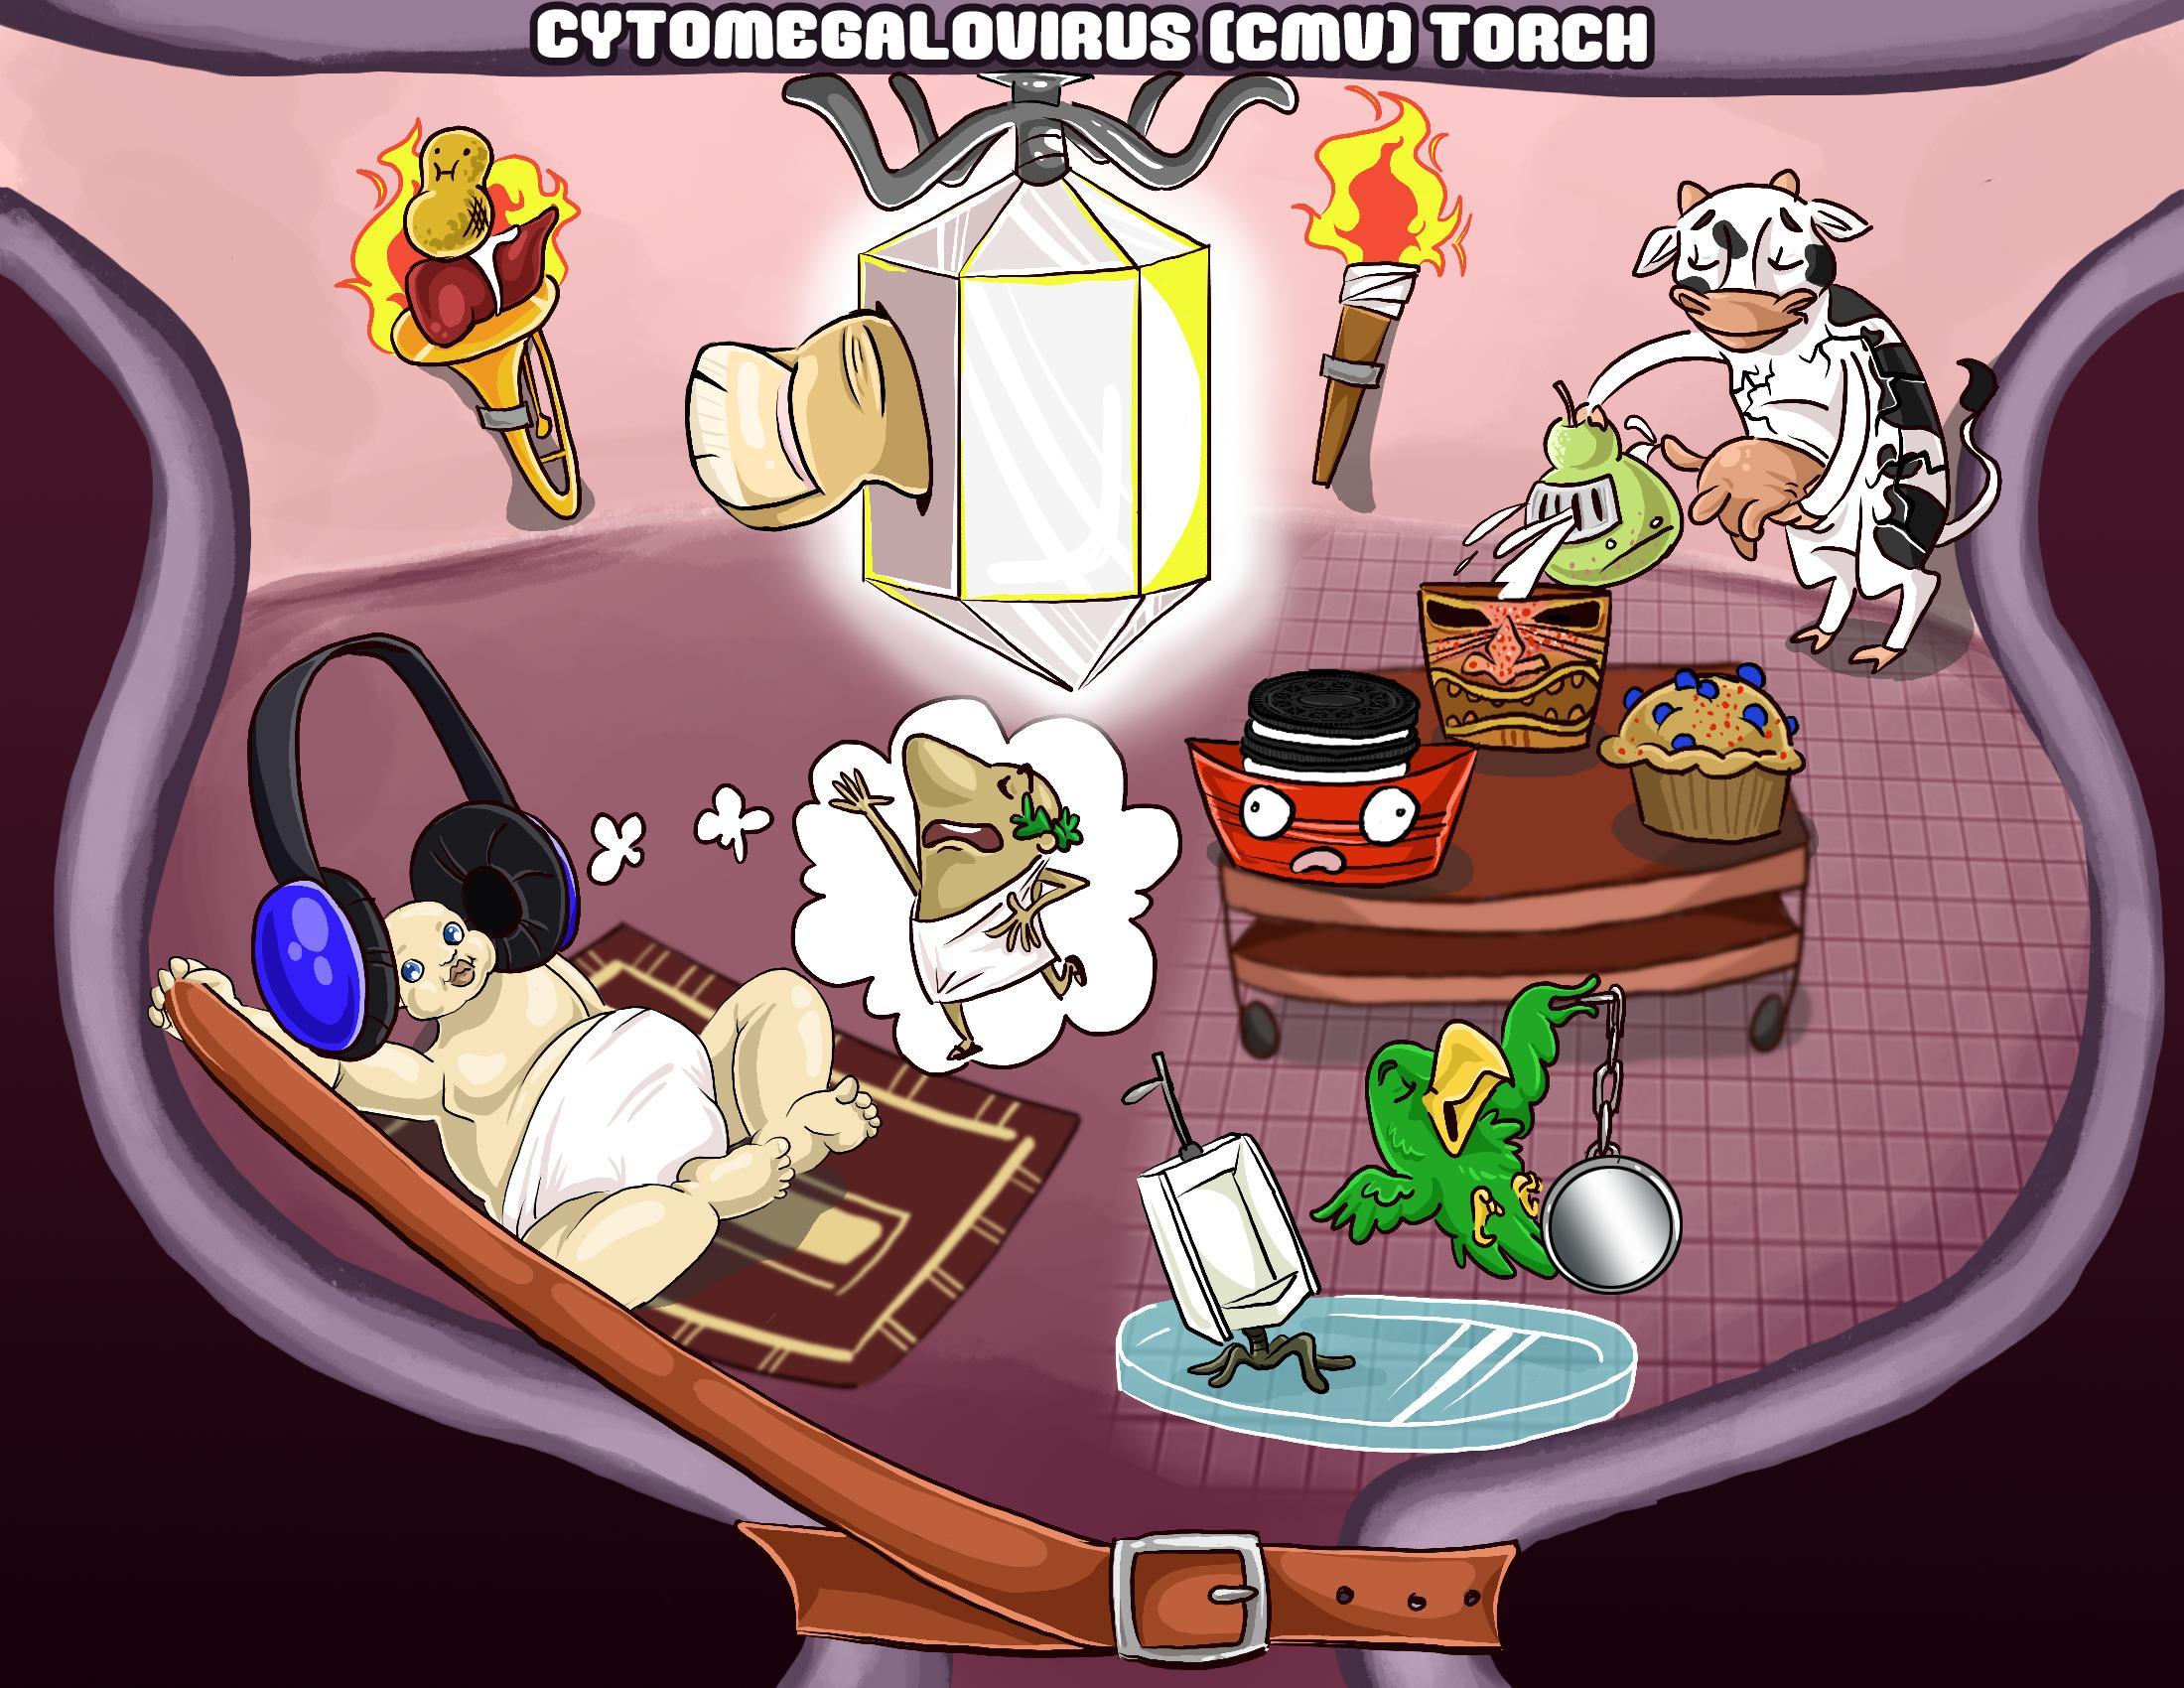 Cytomegalovirus (CMV) TORCH